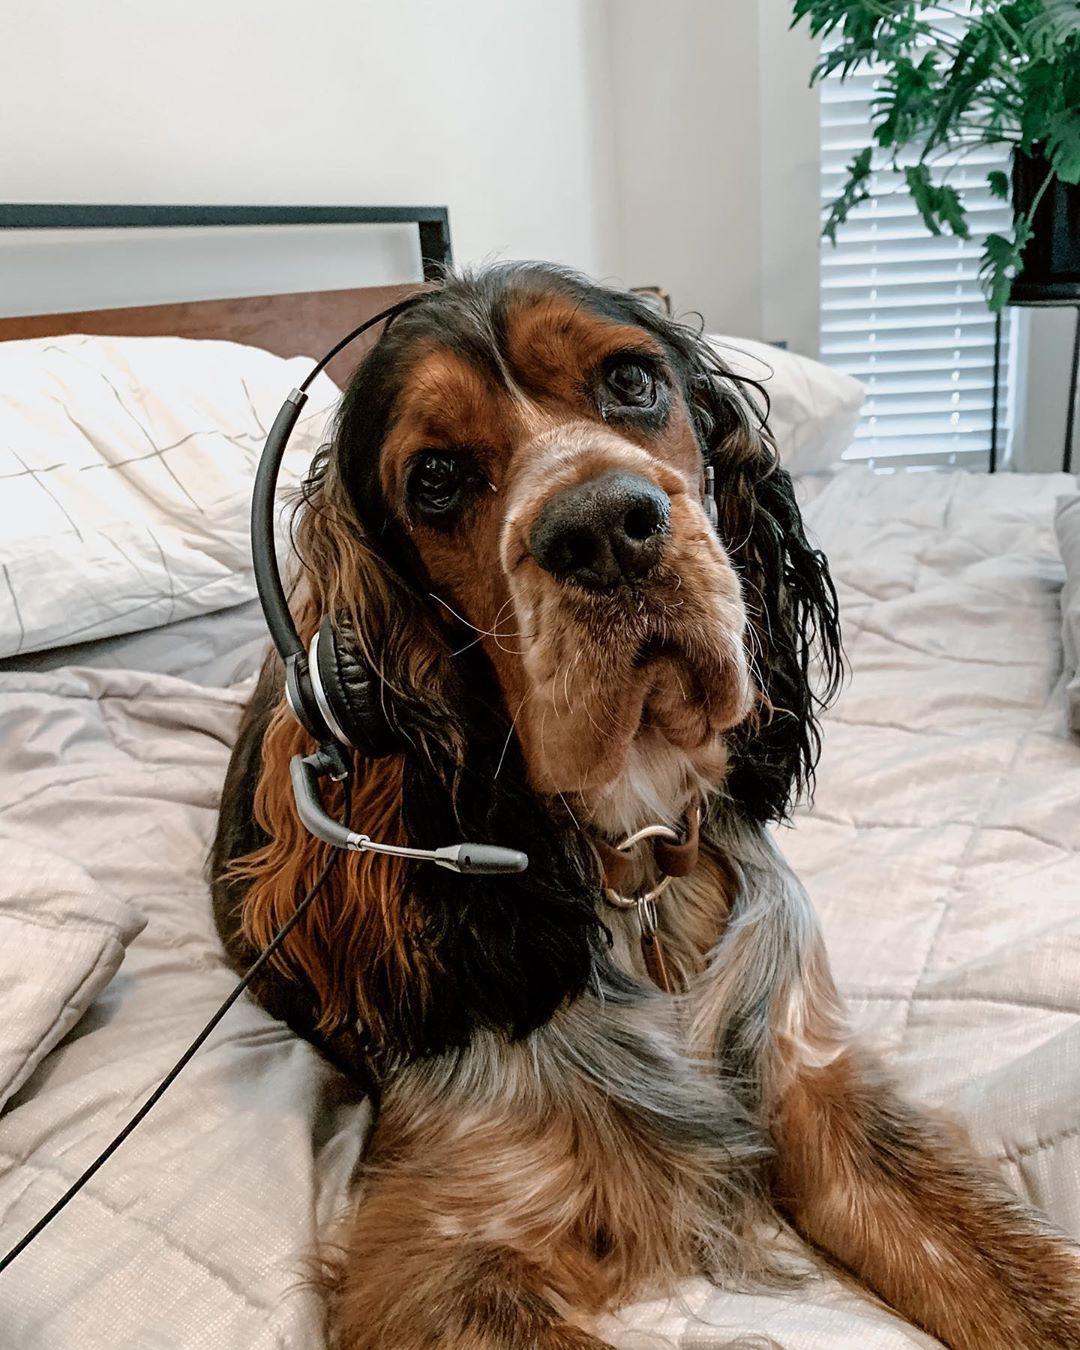 Springer spaniel dog with headset